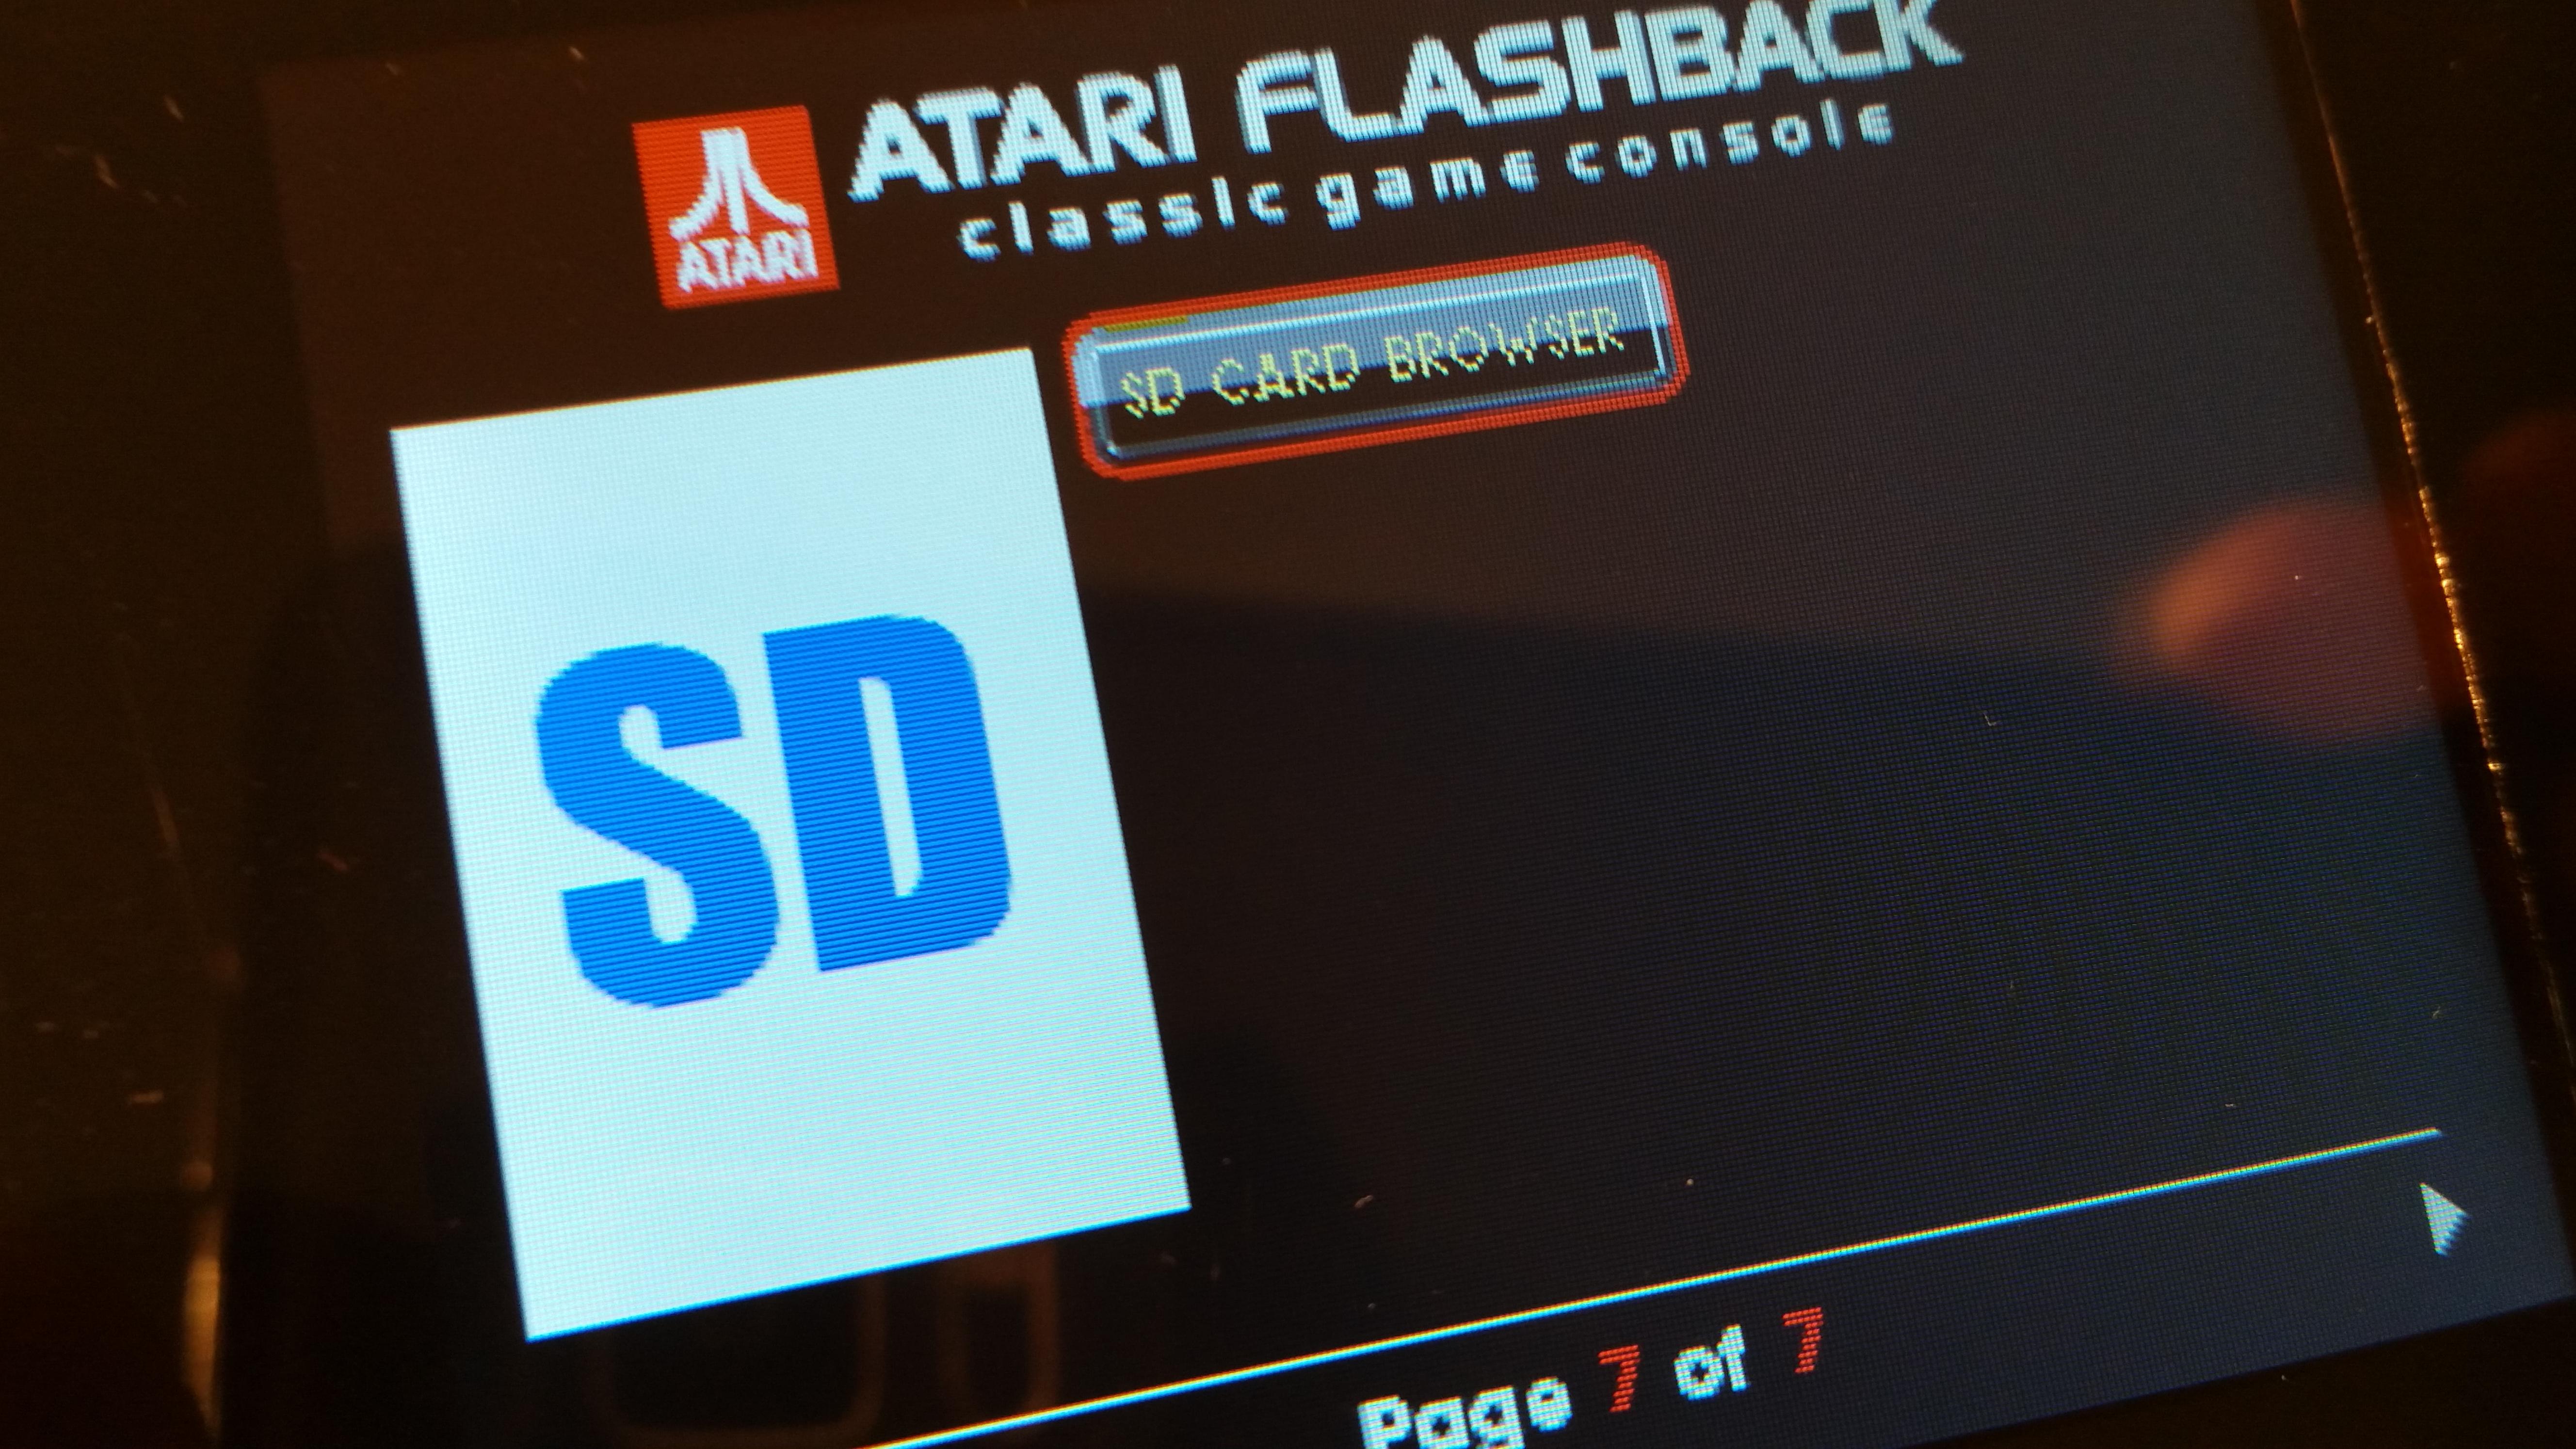 I have this thing: Atari Flashback Portable 2016 – Retro Game SuperHyper